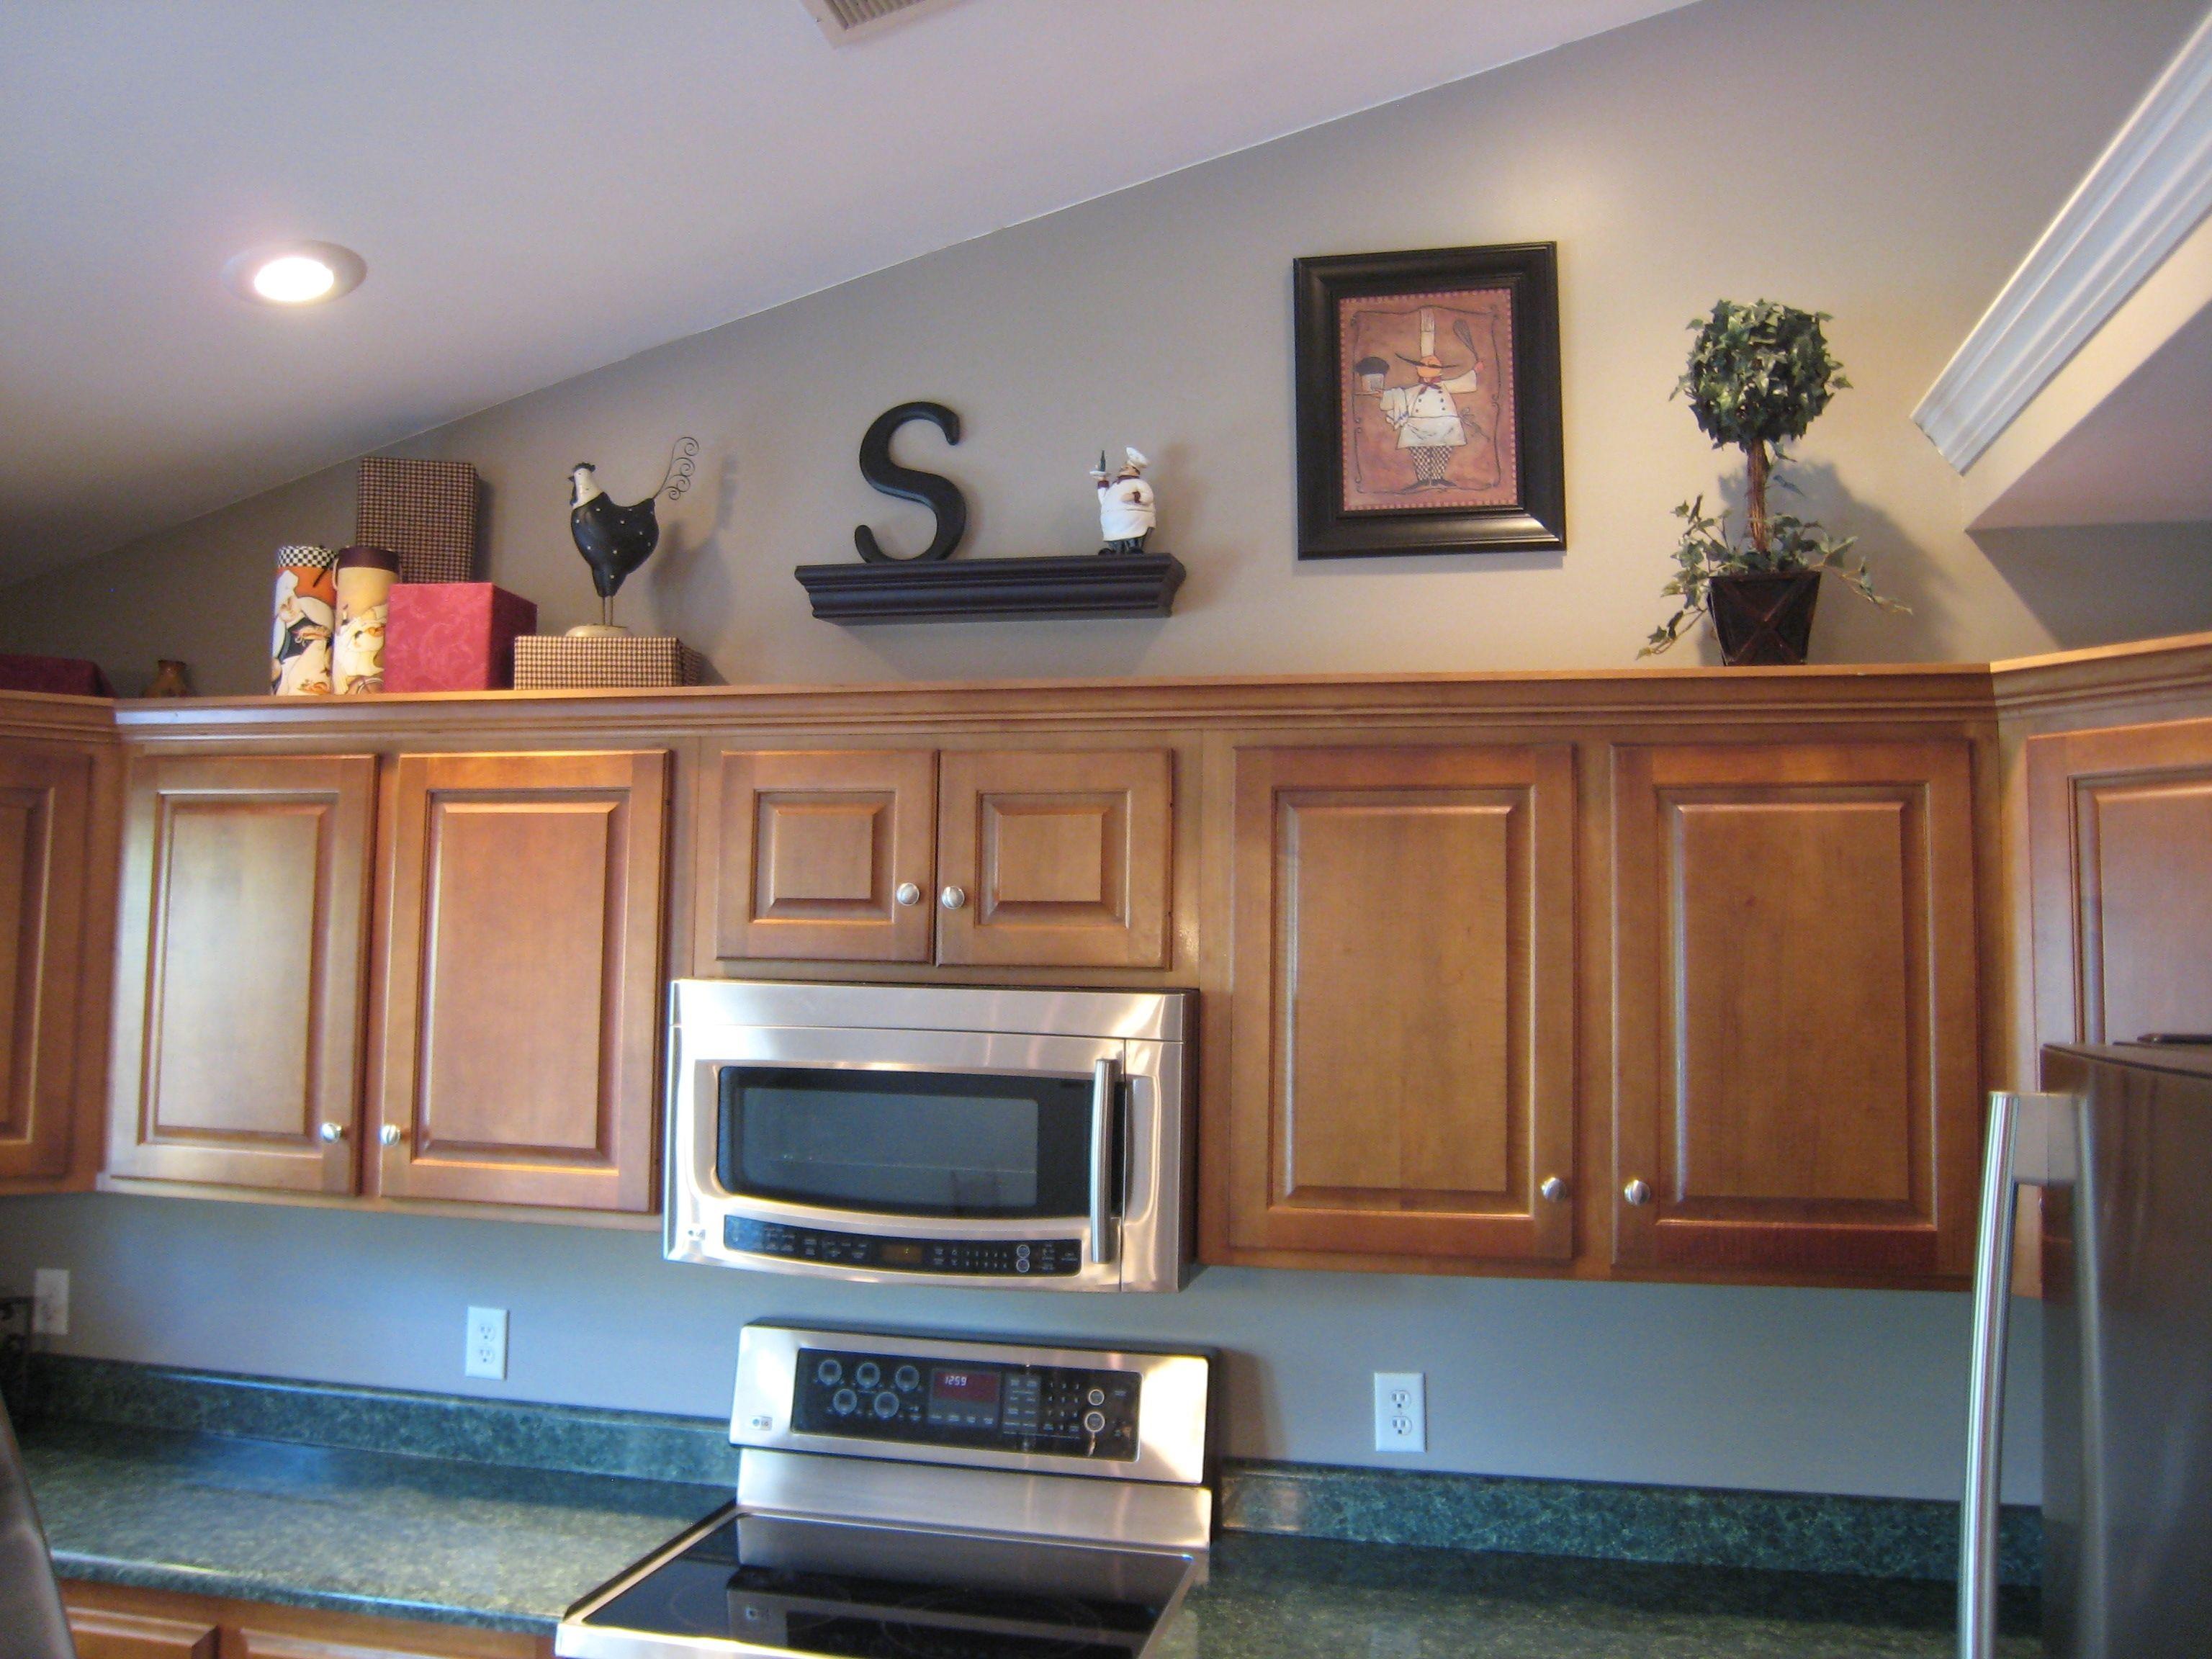 21 Best Farmhouse Kitchens Design And Decor Ideas For 2018 Kitchen Cabinets Decor Above Kitchen Cabinets Cabinet Decor